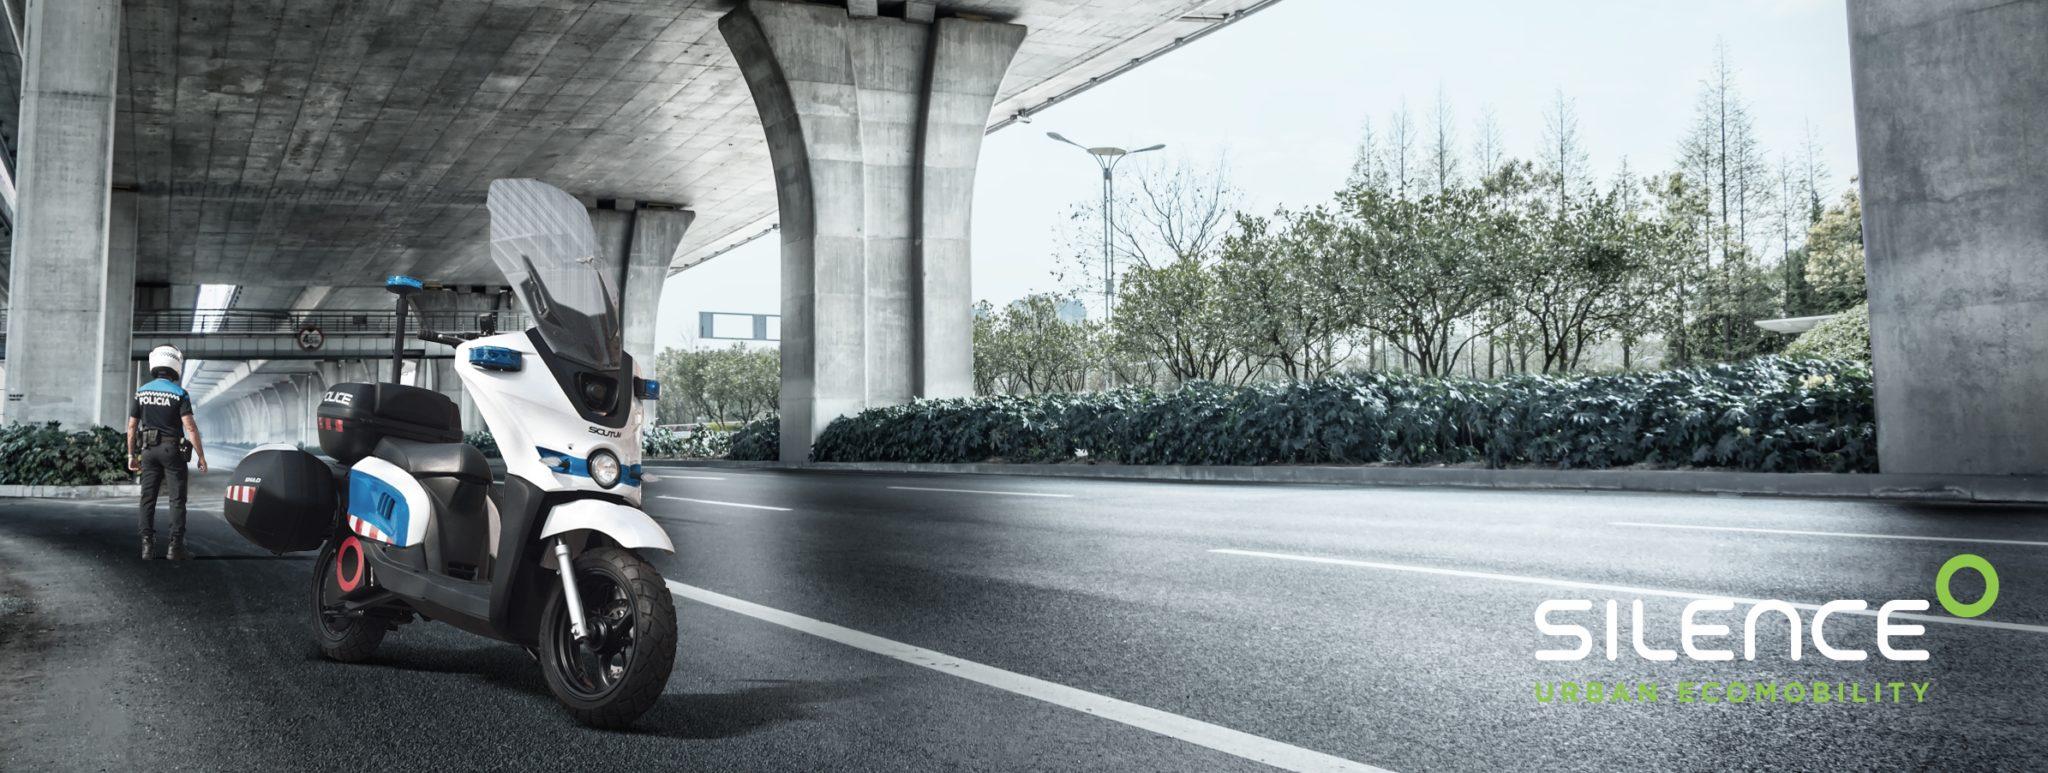 Električni skuter Silence Scutum